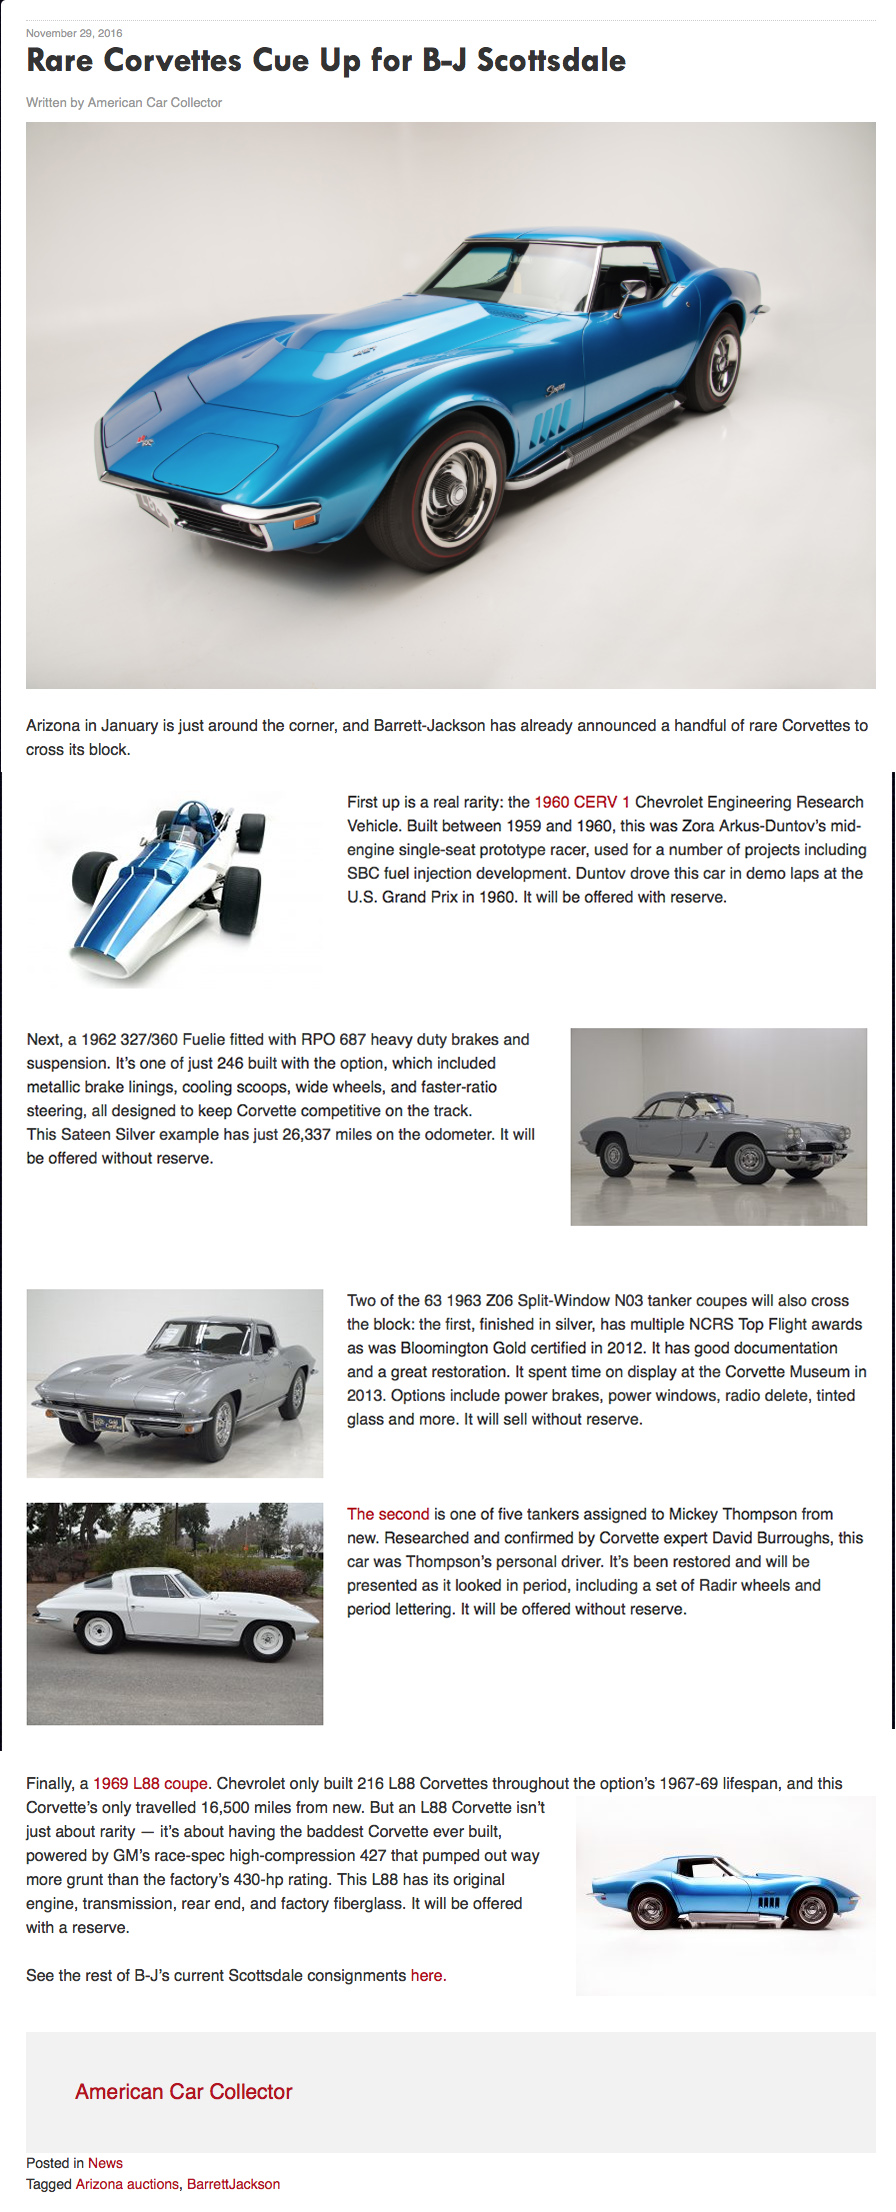 American Car Collector Nov 29, 2016: Rare Vettes Cue Up For